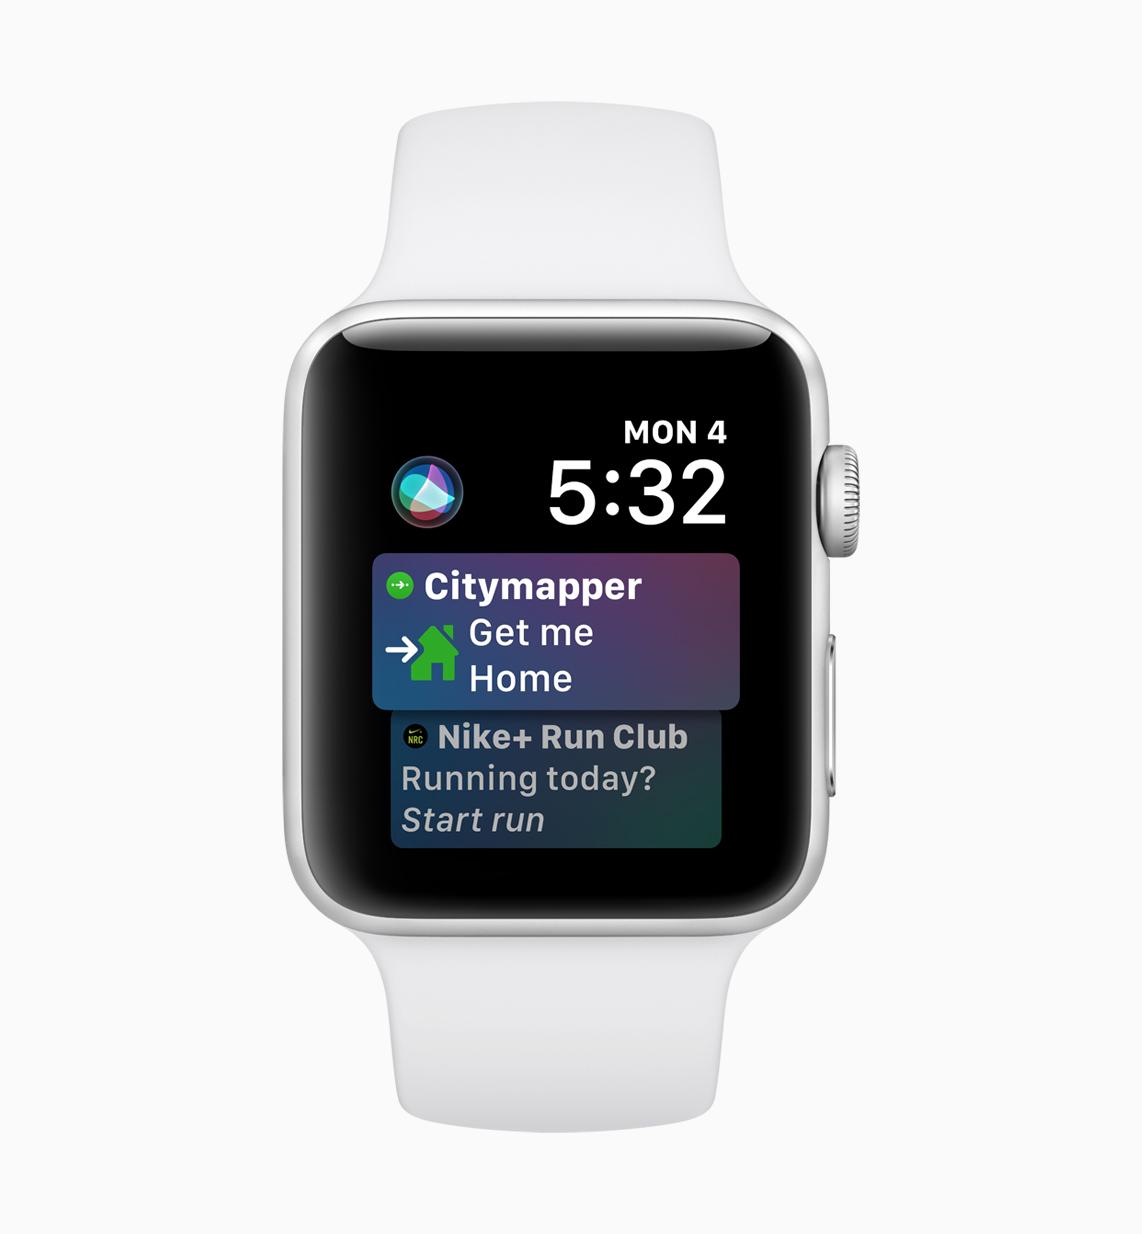 Apple Watch Siri face